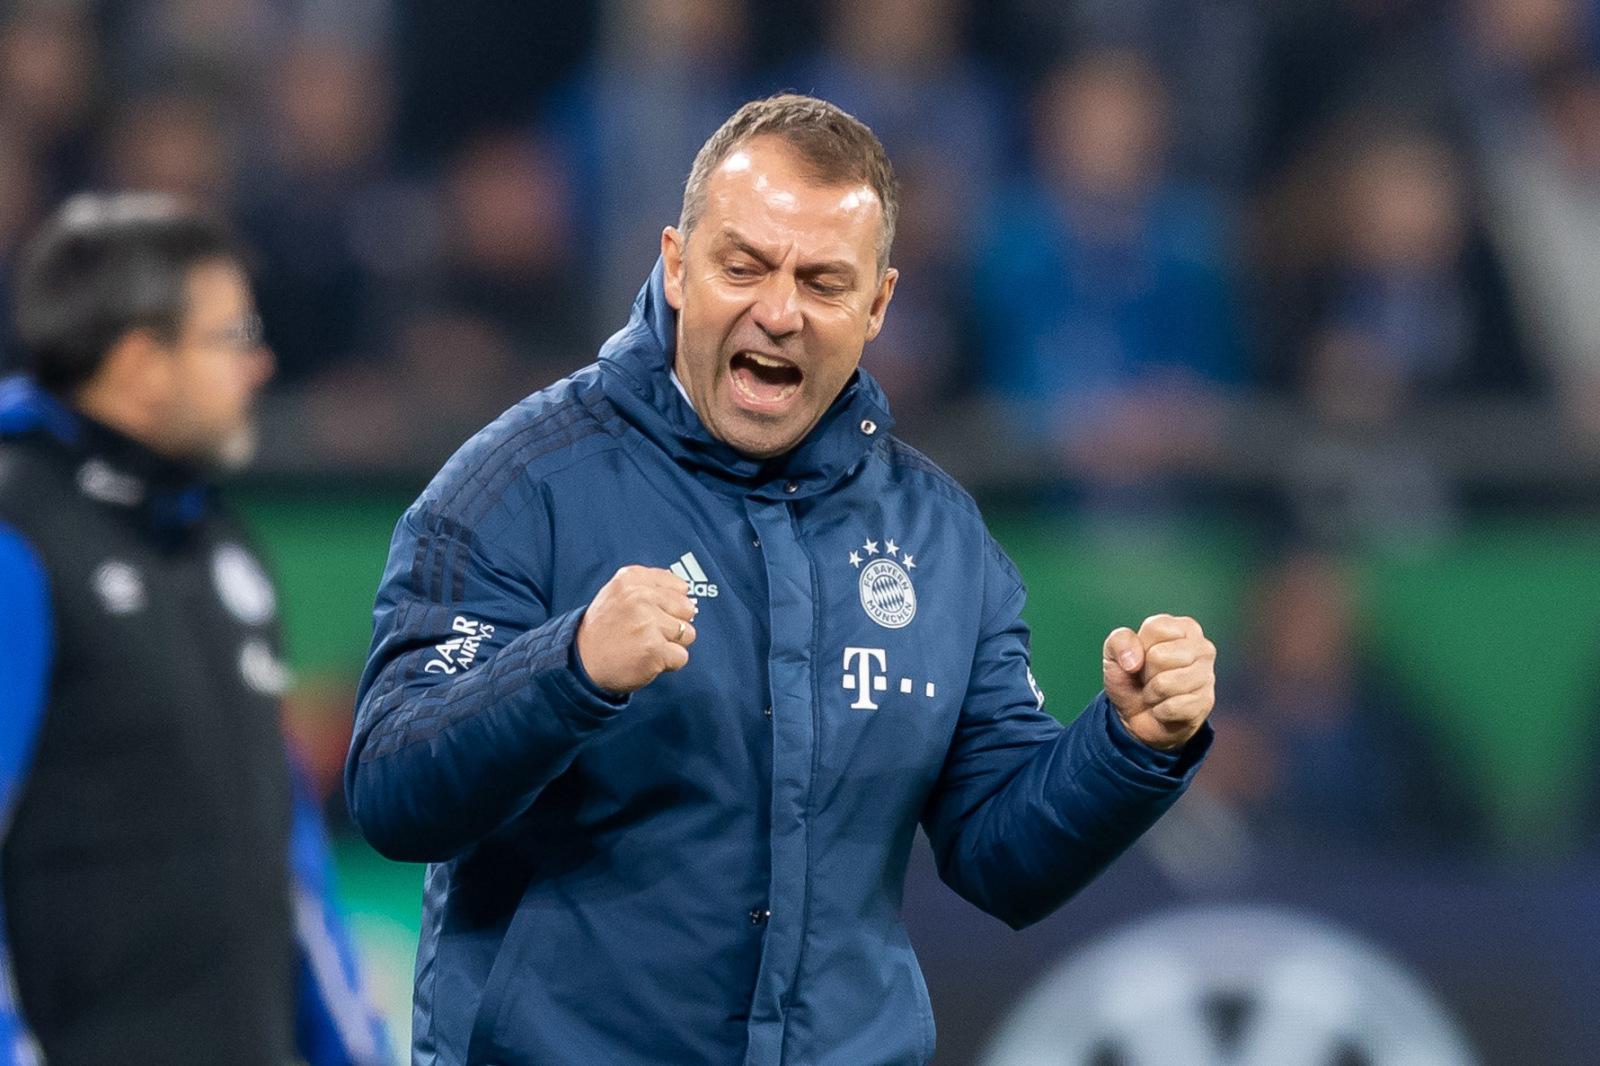 Barca muốn bổ nhiệm Hansi Flick